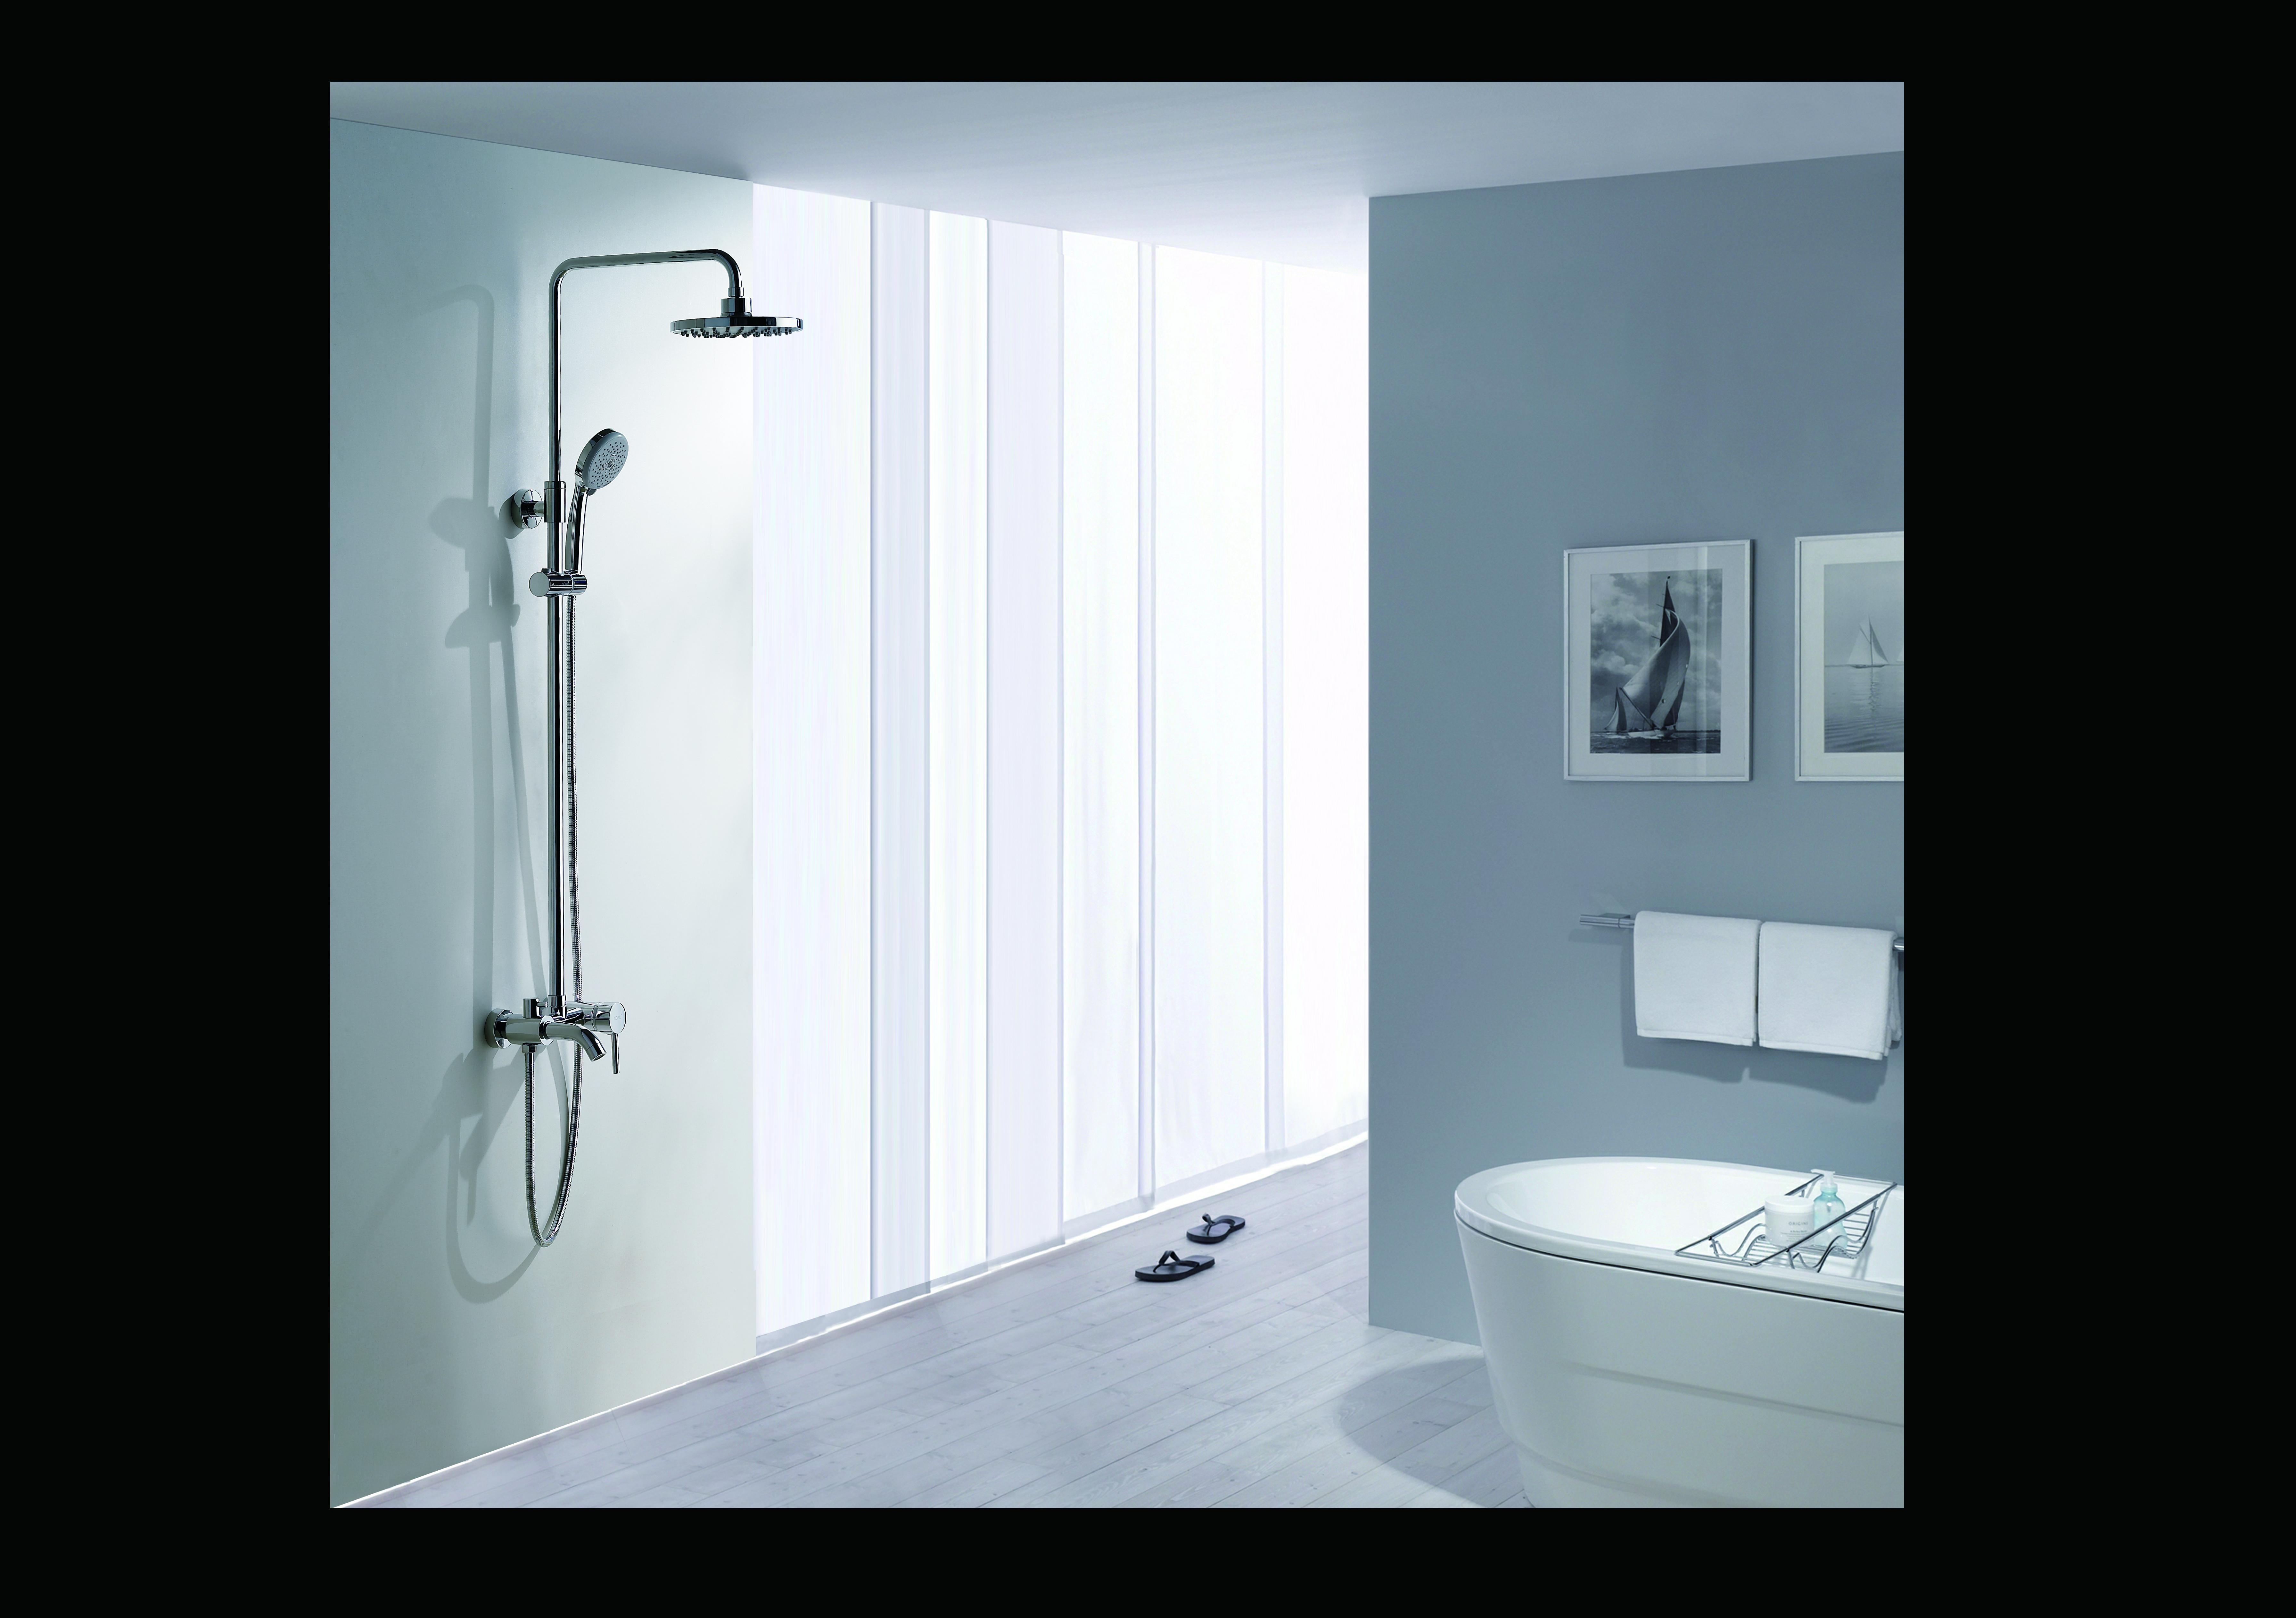 How To Fix A Loose Single Handle Shower Faucet Zhejiang